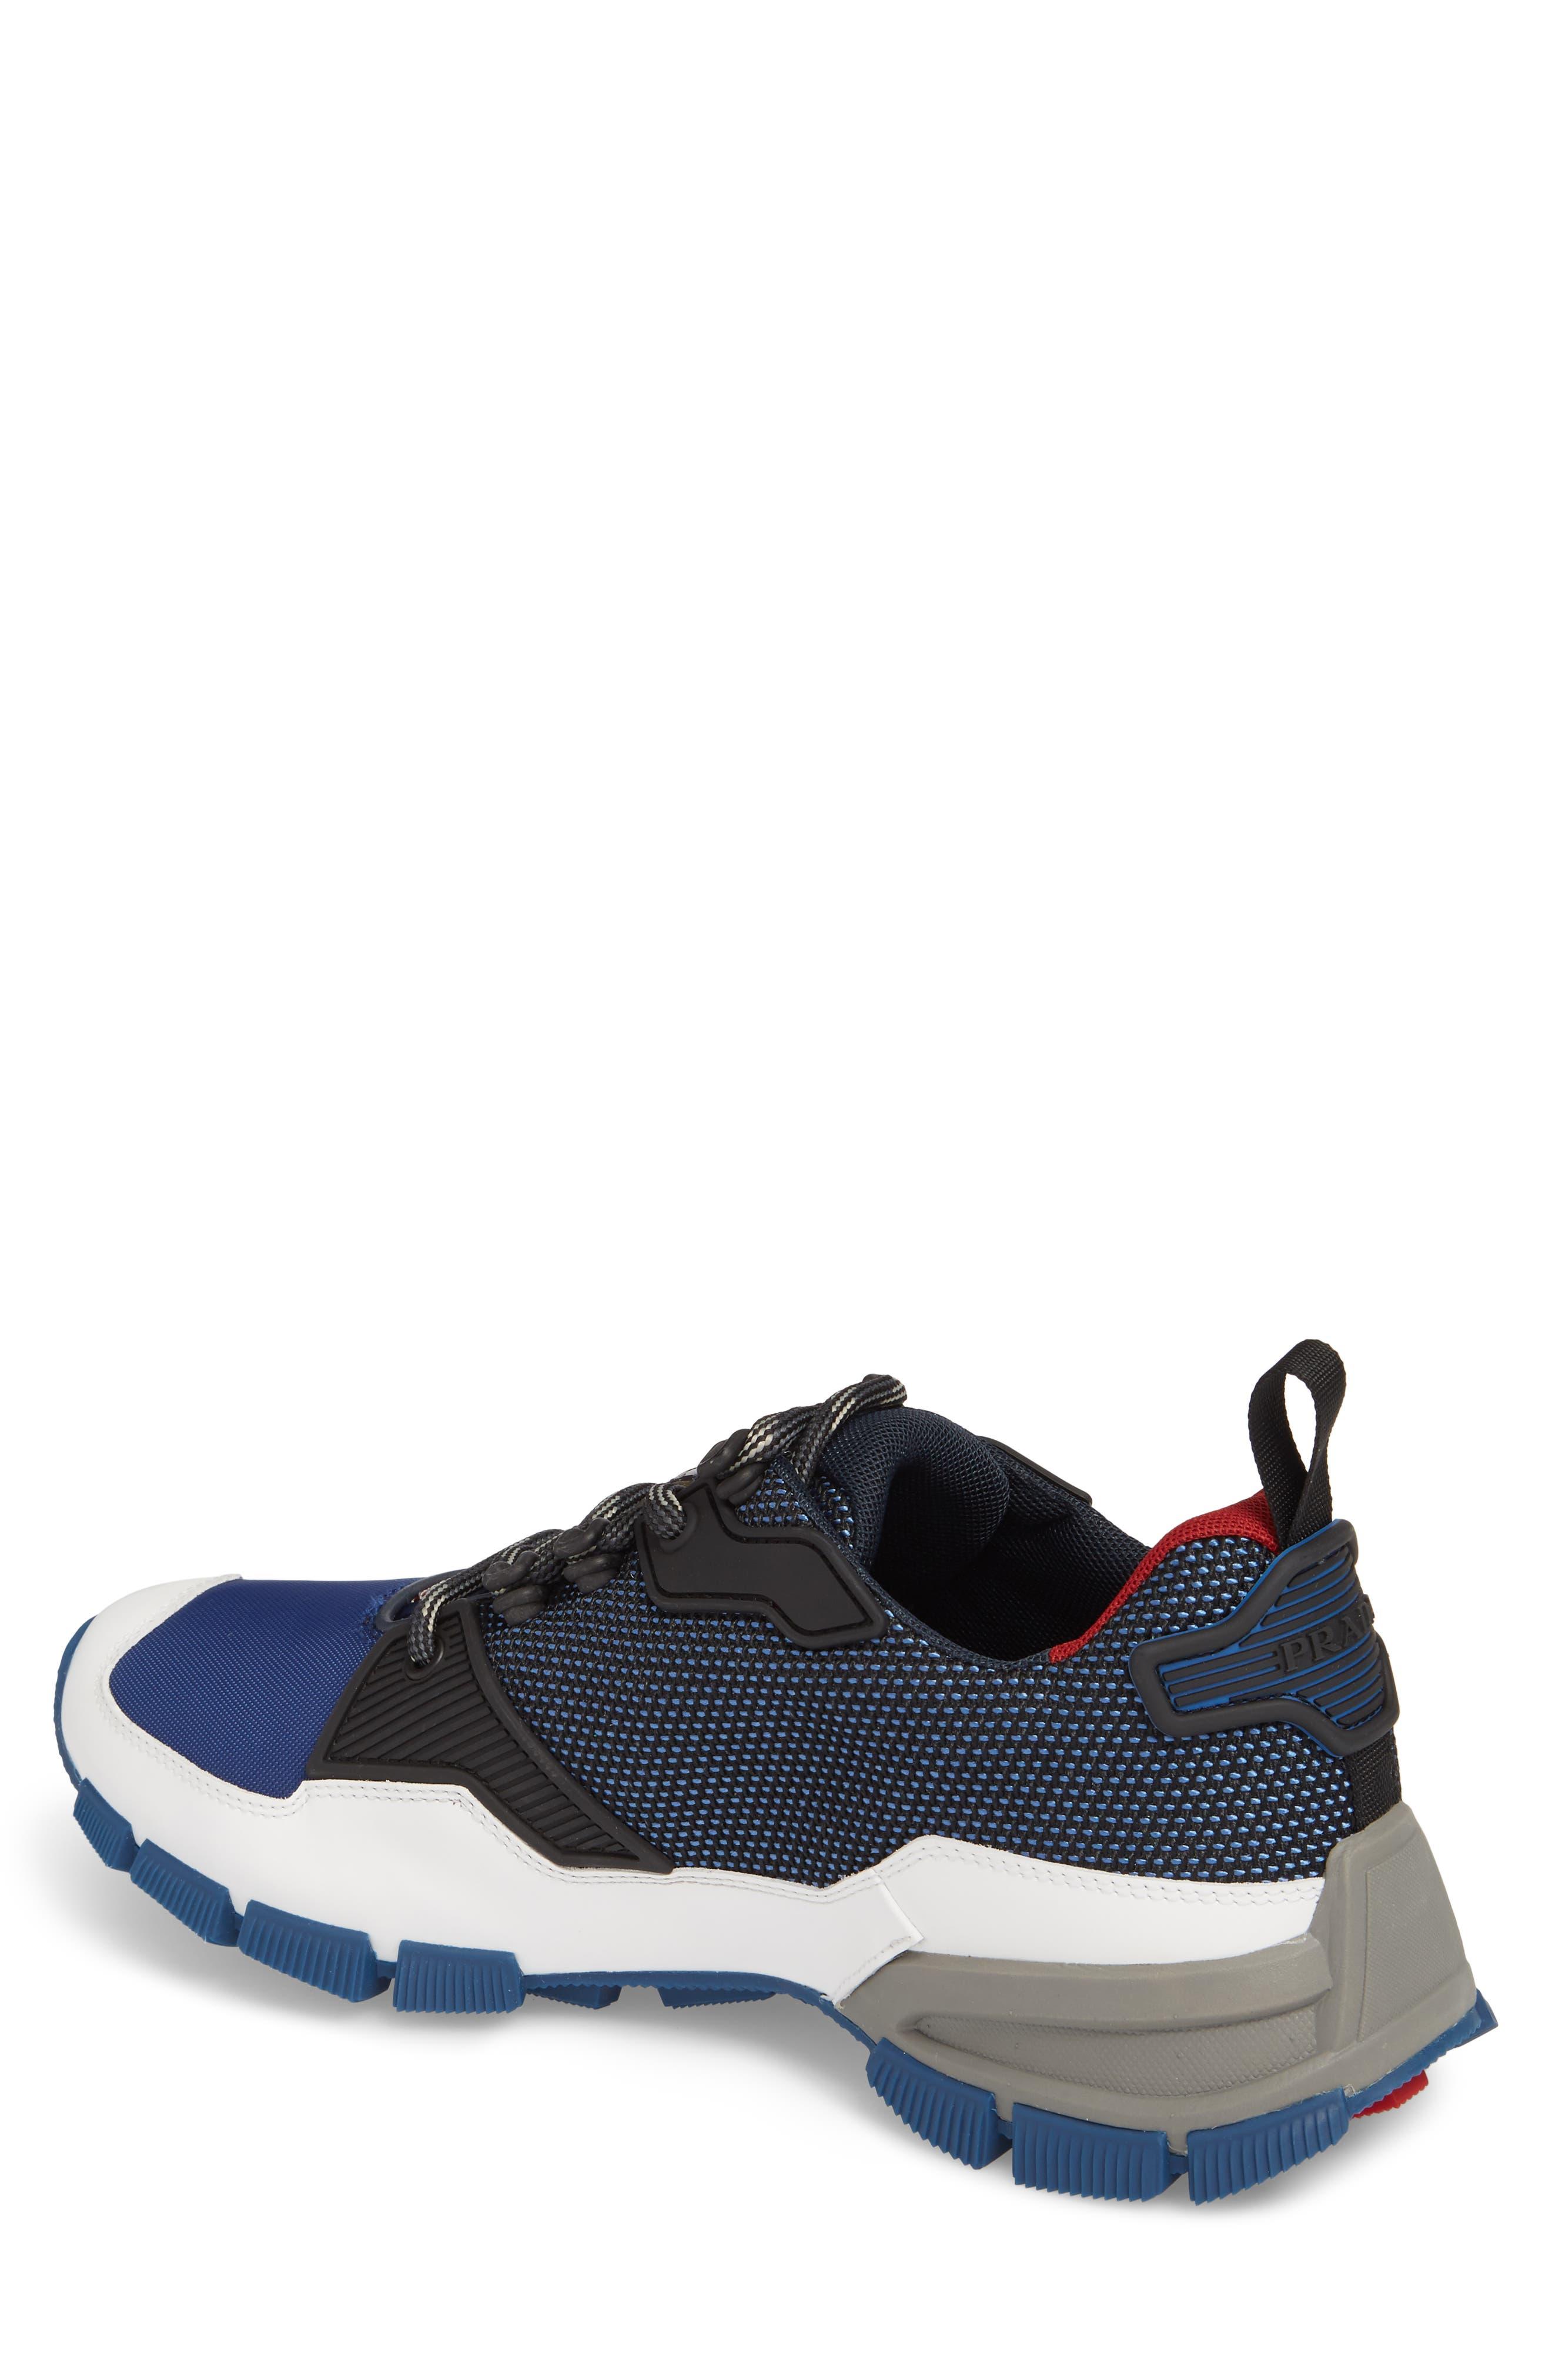 Alternate Image 2  - Prada Linea Rossa Tech Lug Sneaker (Men)